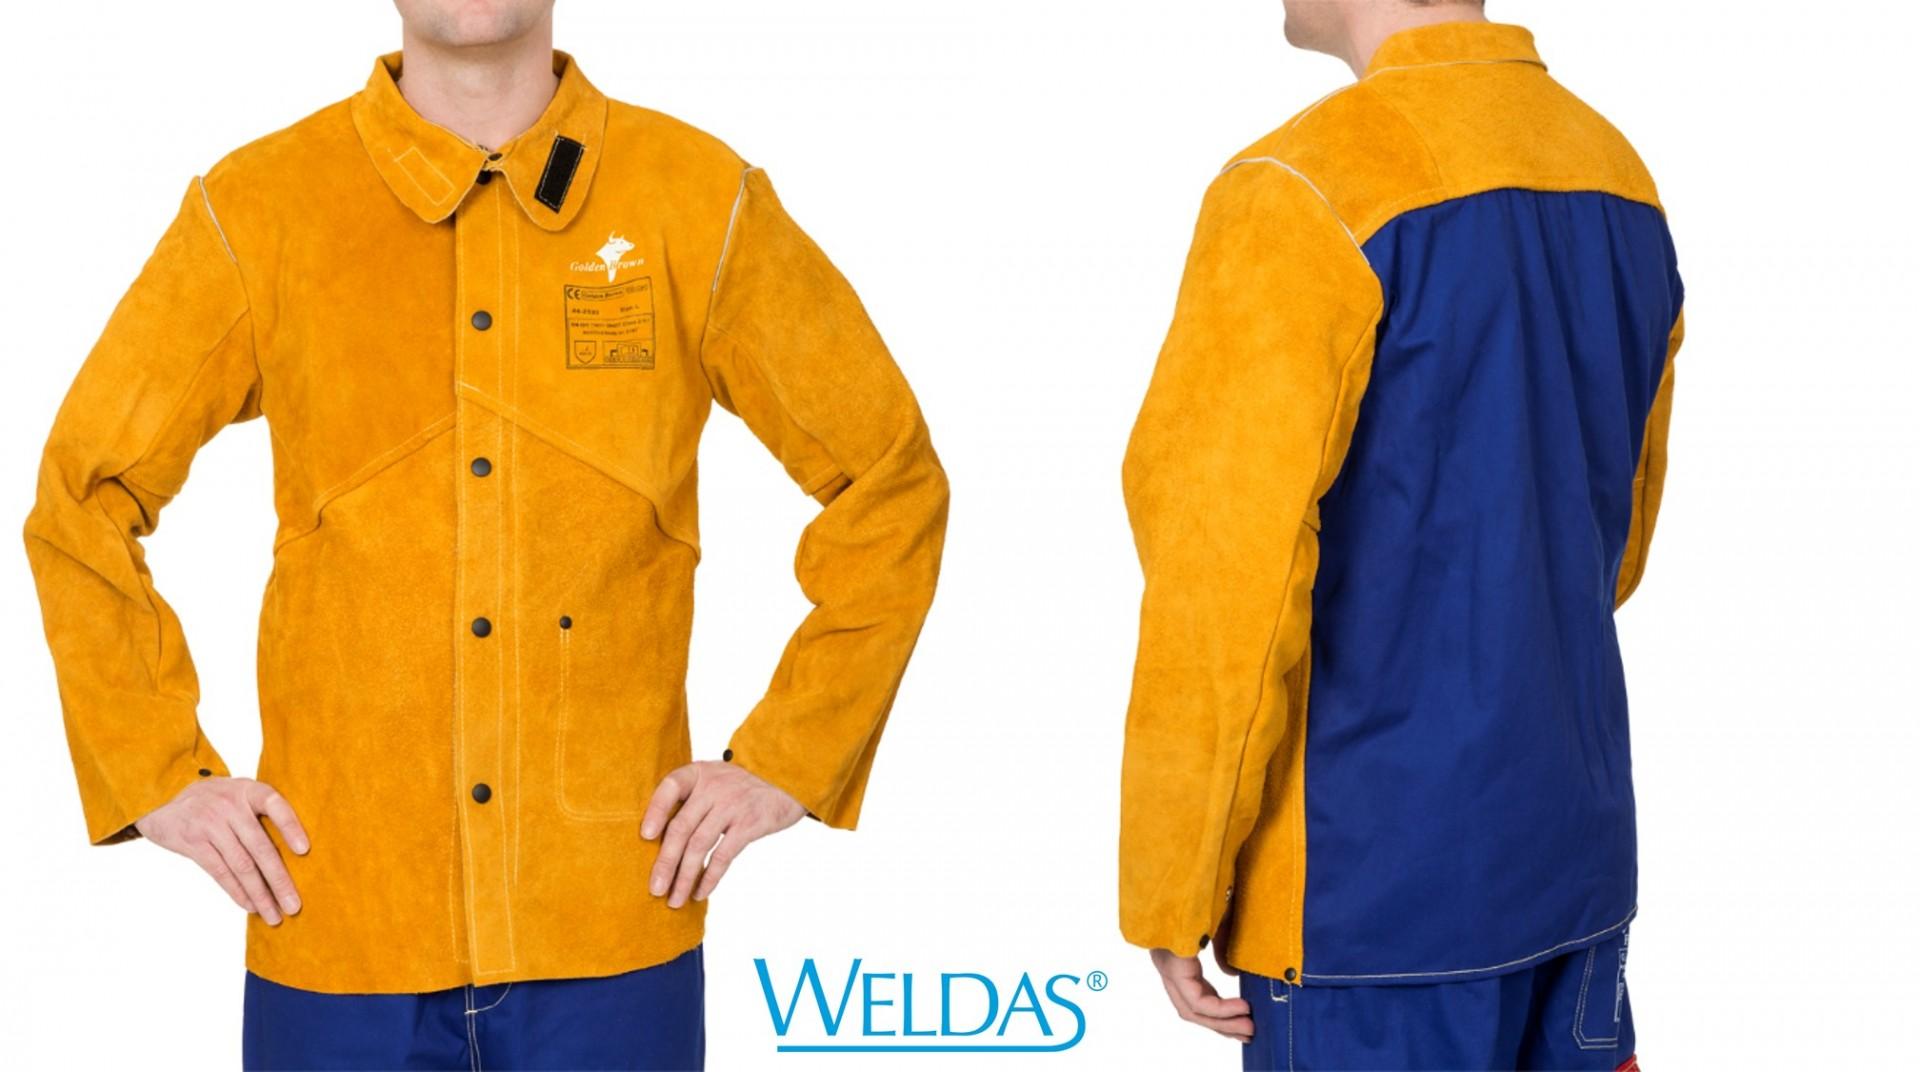 Casaco WELDAS Golden Brown Costas de Algodão 44-2530/P